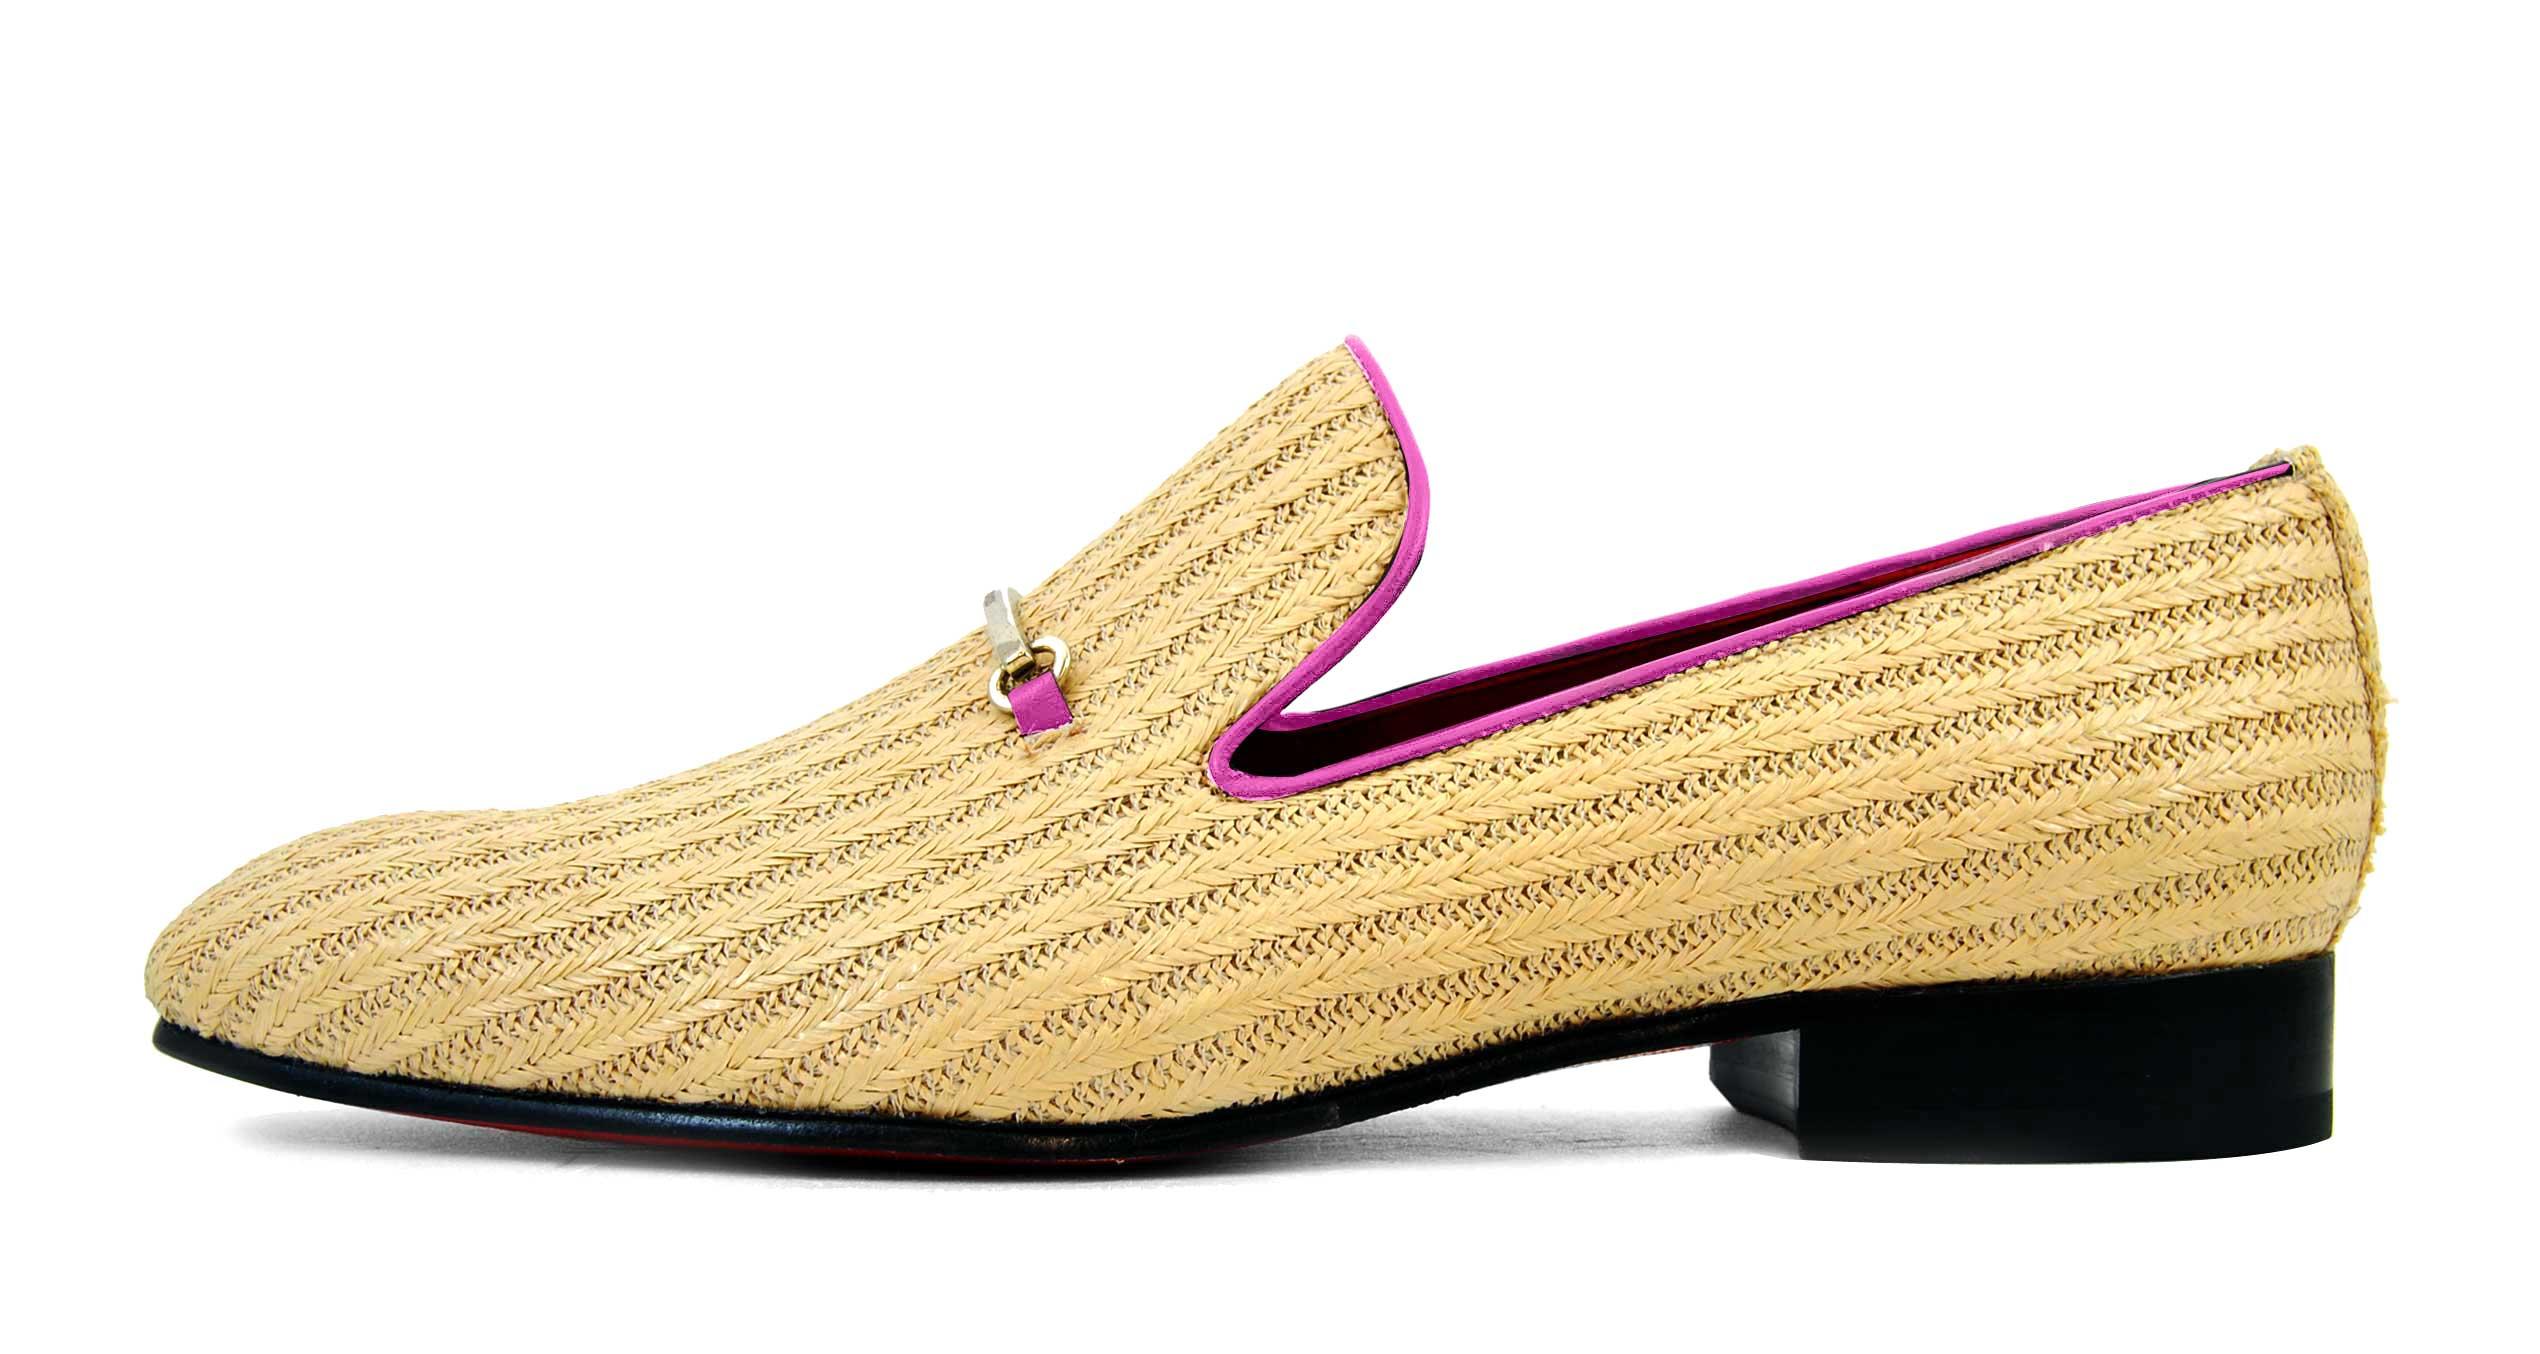 Foto 1 de Zapatos Palma Panameña Con Ribete Rosa